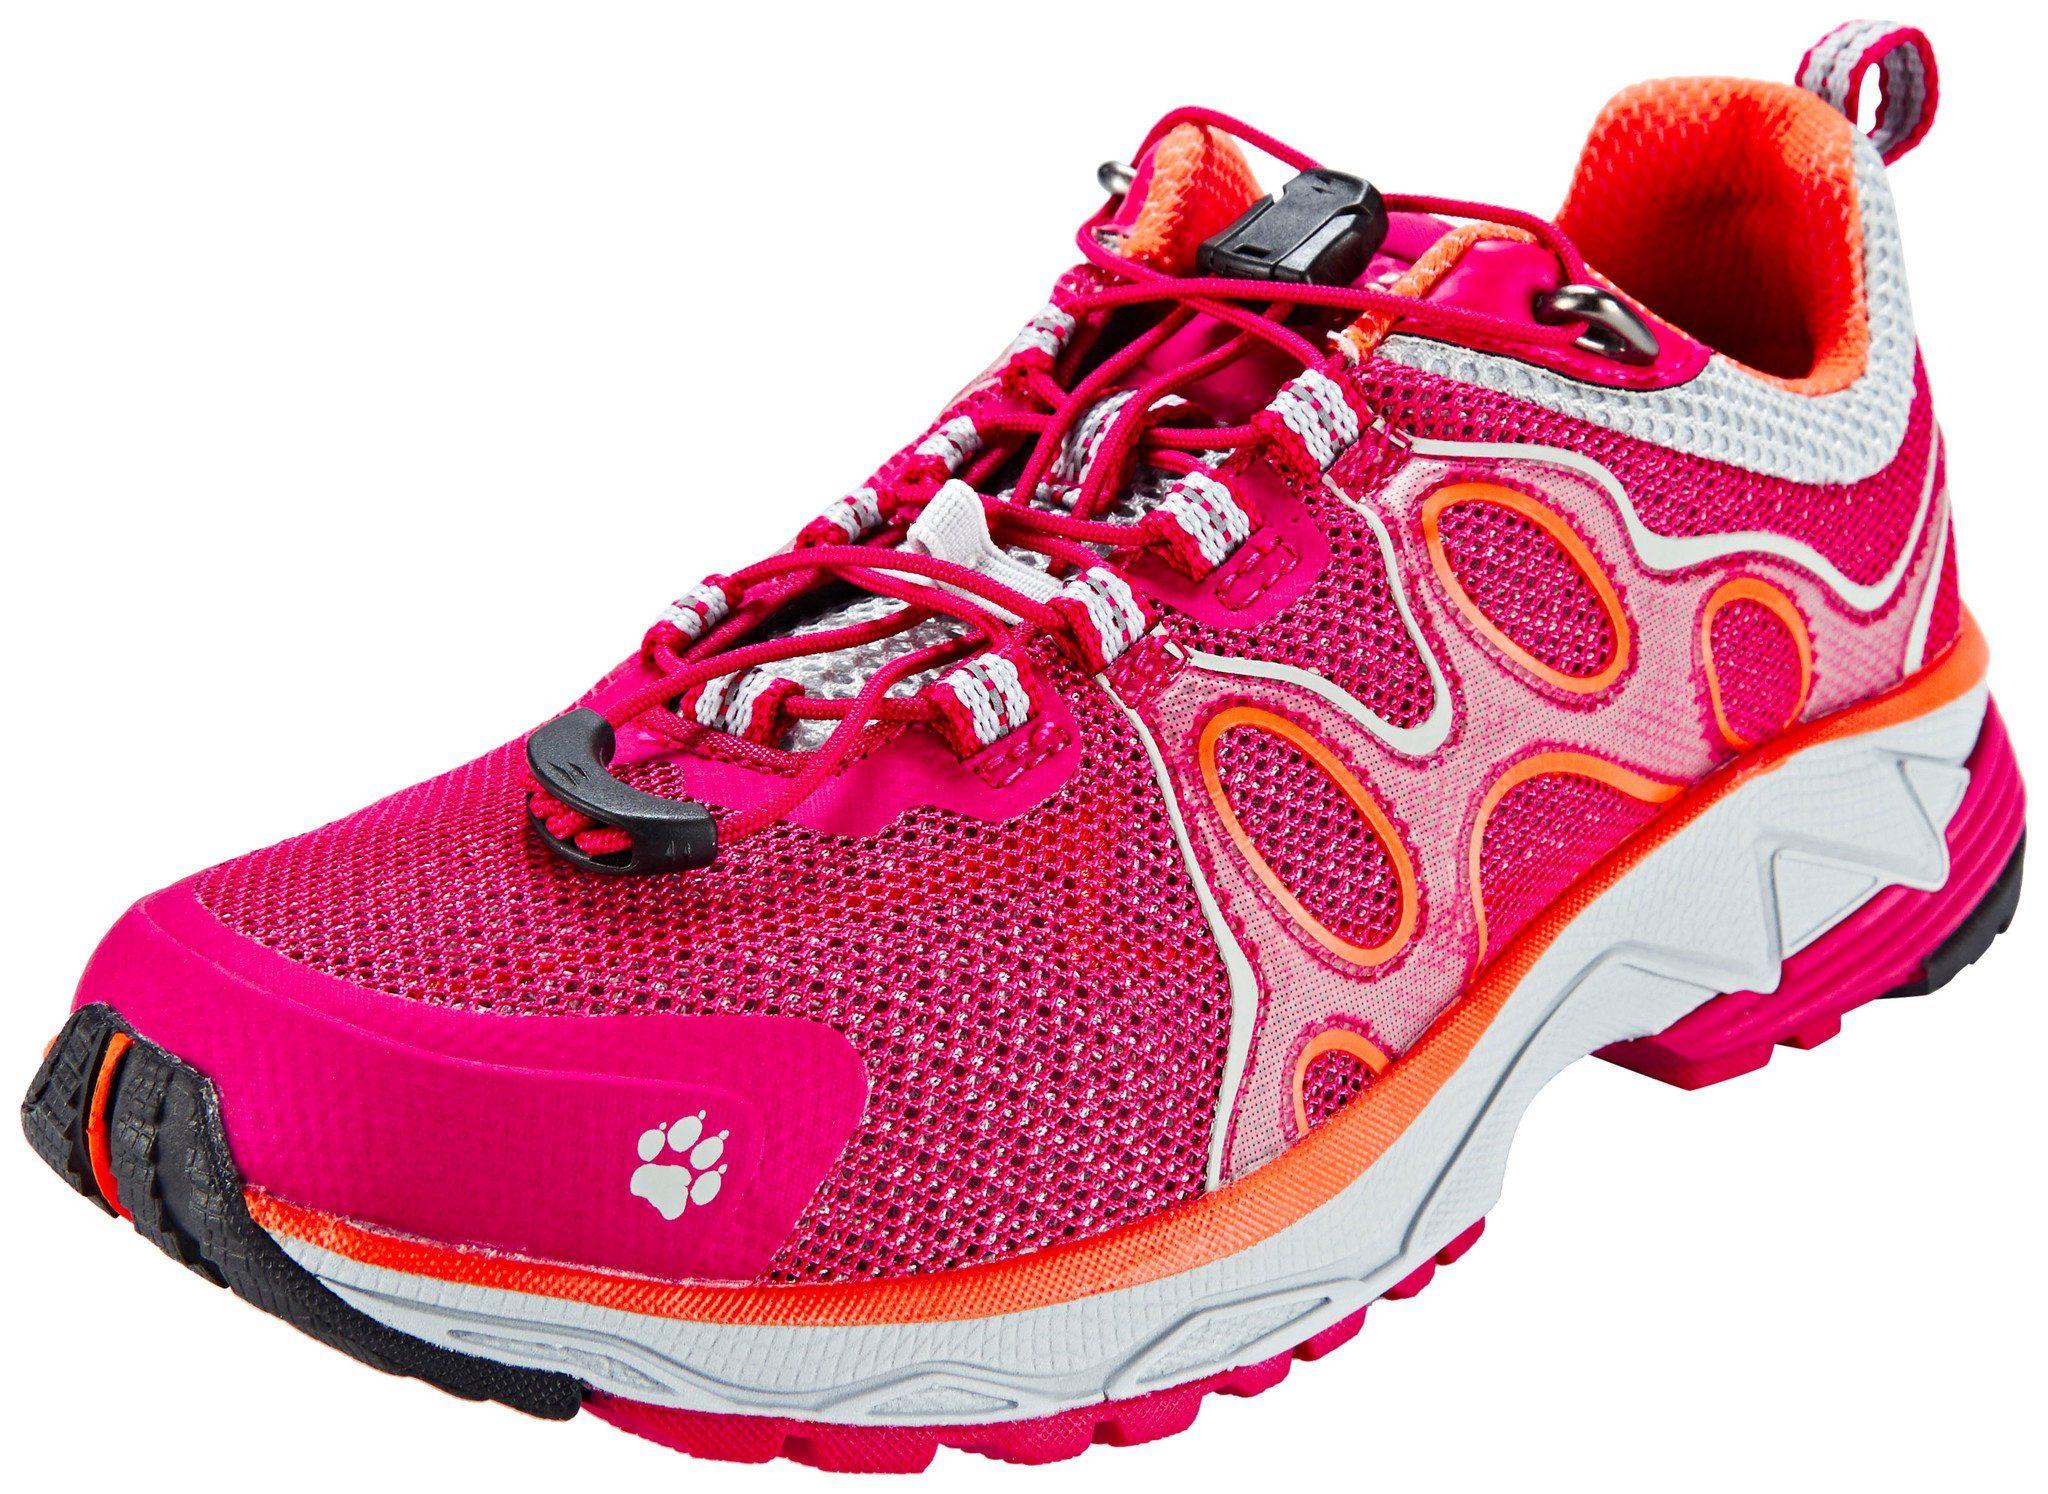 Jack Wolfskin Runningschuh »Passion Trail Low Trailrunning Shoes Women«